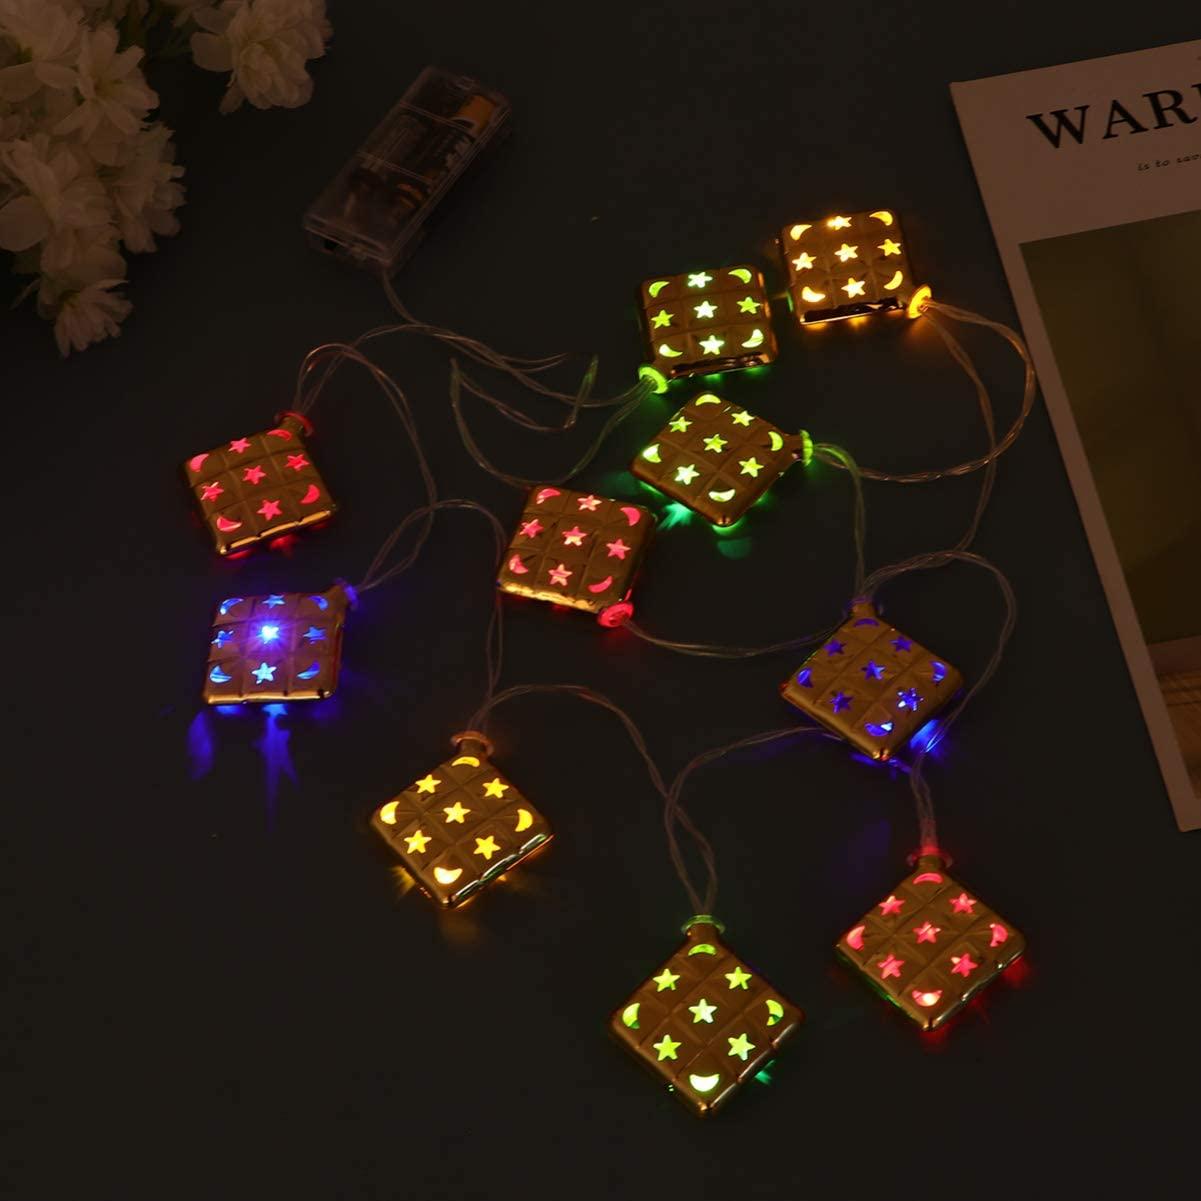 Uonlytech Muslim Ramadan String Lights, 1.65M 10LEDs Golden Eid String Lights, Party Lights for Eid Festival Christmas Bedroom Banquet Decorations(Colorful Light)